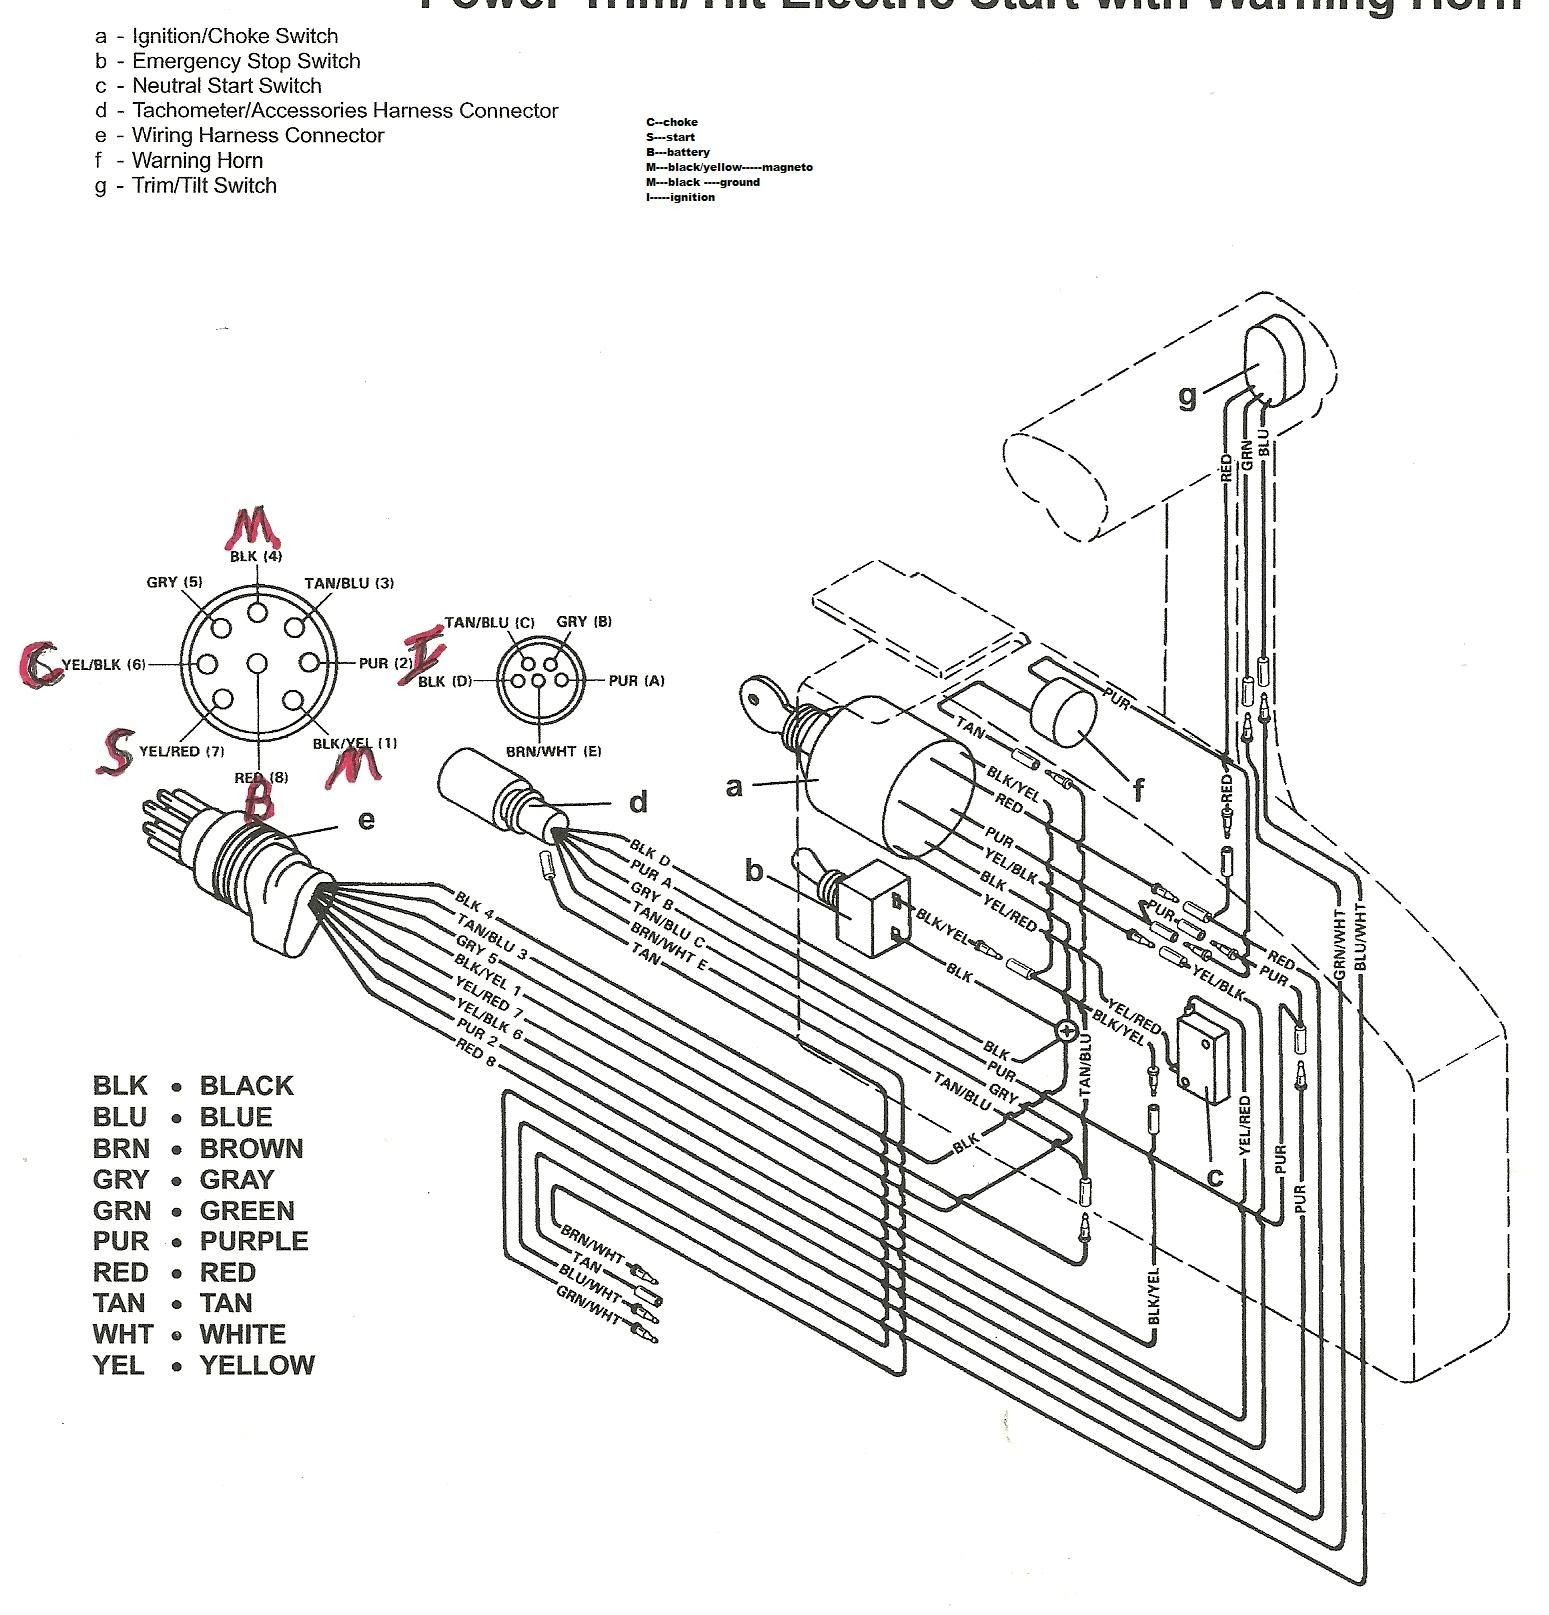 New Wiring Diagram For Emergency Key Switch Diagram Mercury Outboard Emergency